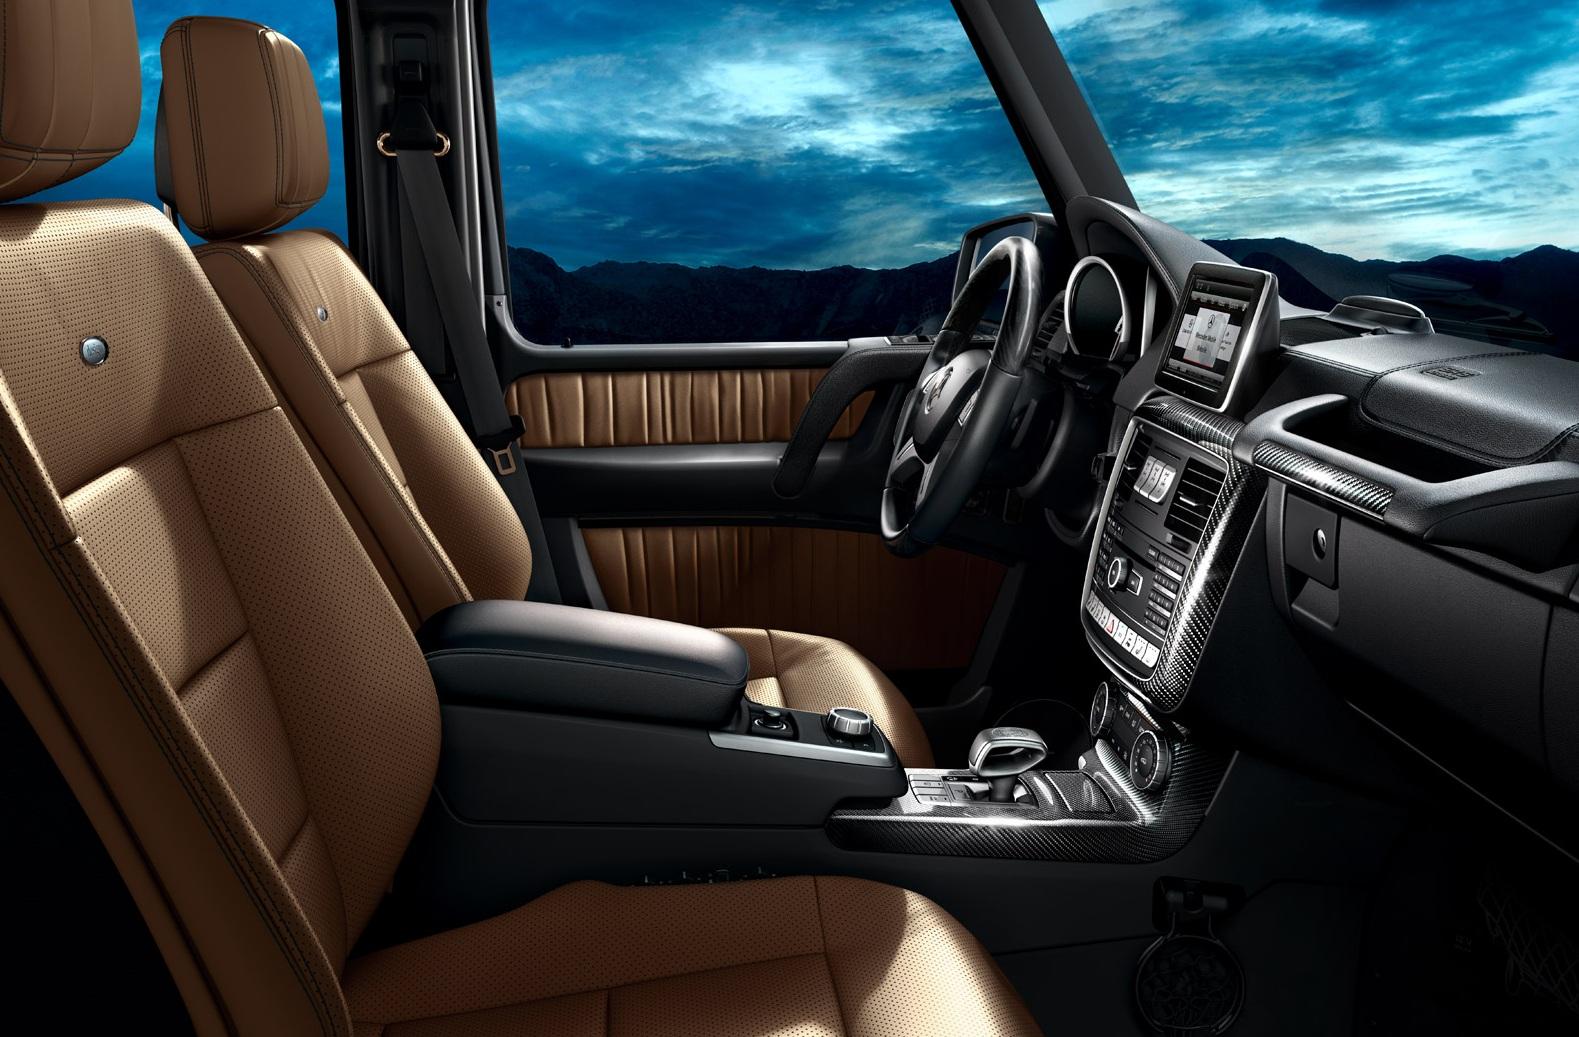 mercedes benz g class dash - G Wagon Matte Black Interior